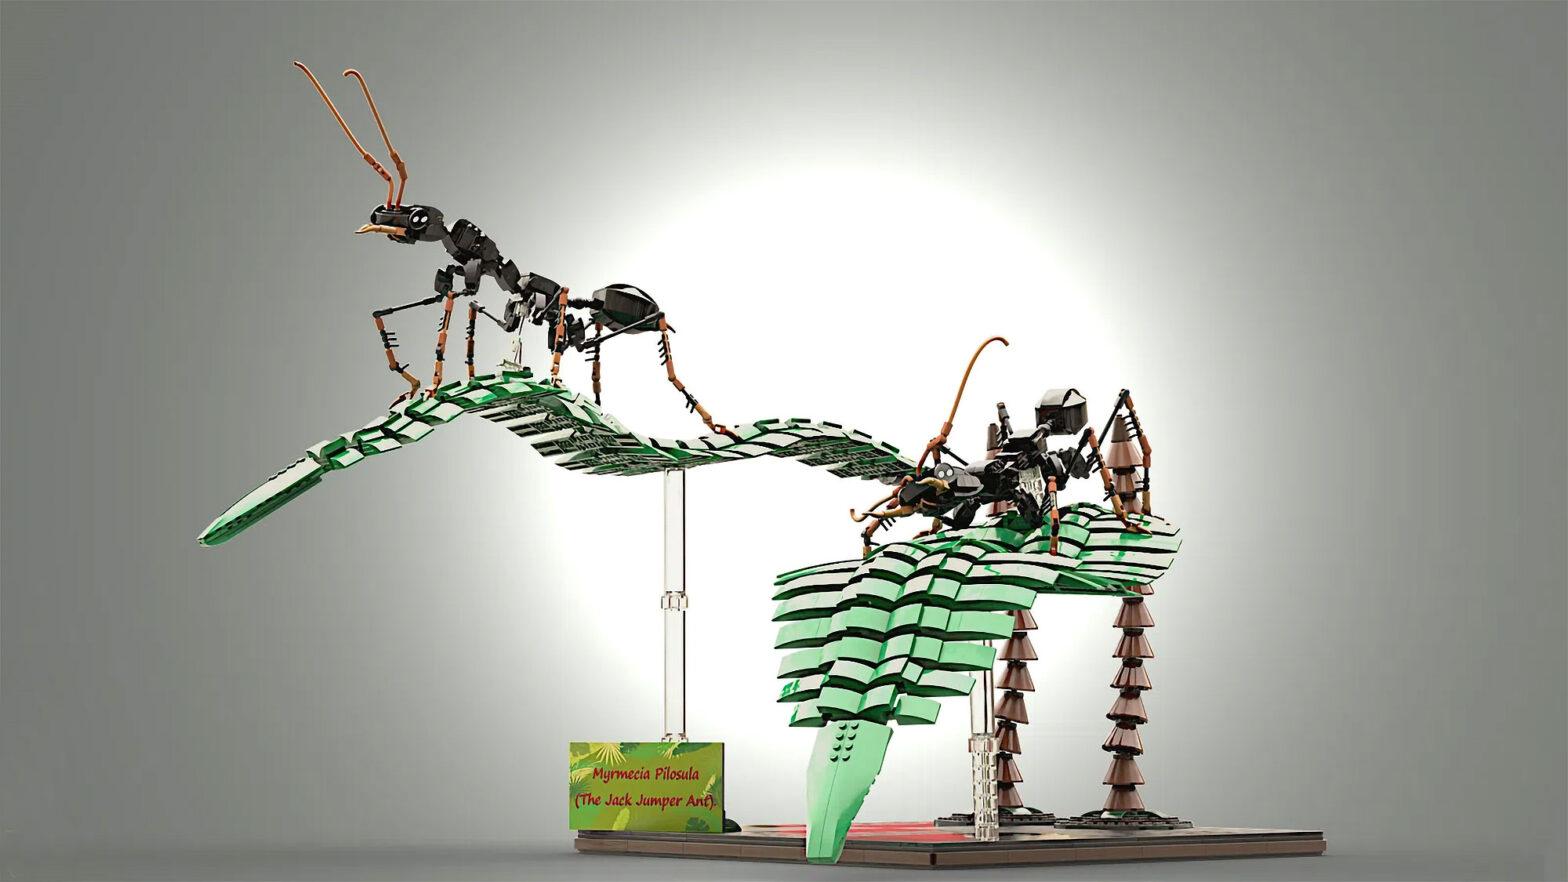 Custom LEGO Jack Jumper Ant by Slekk024